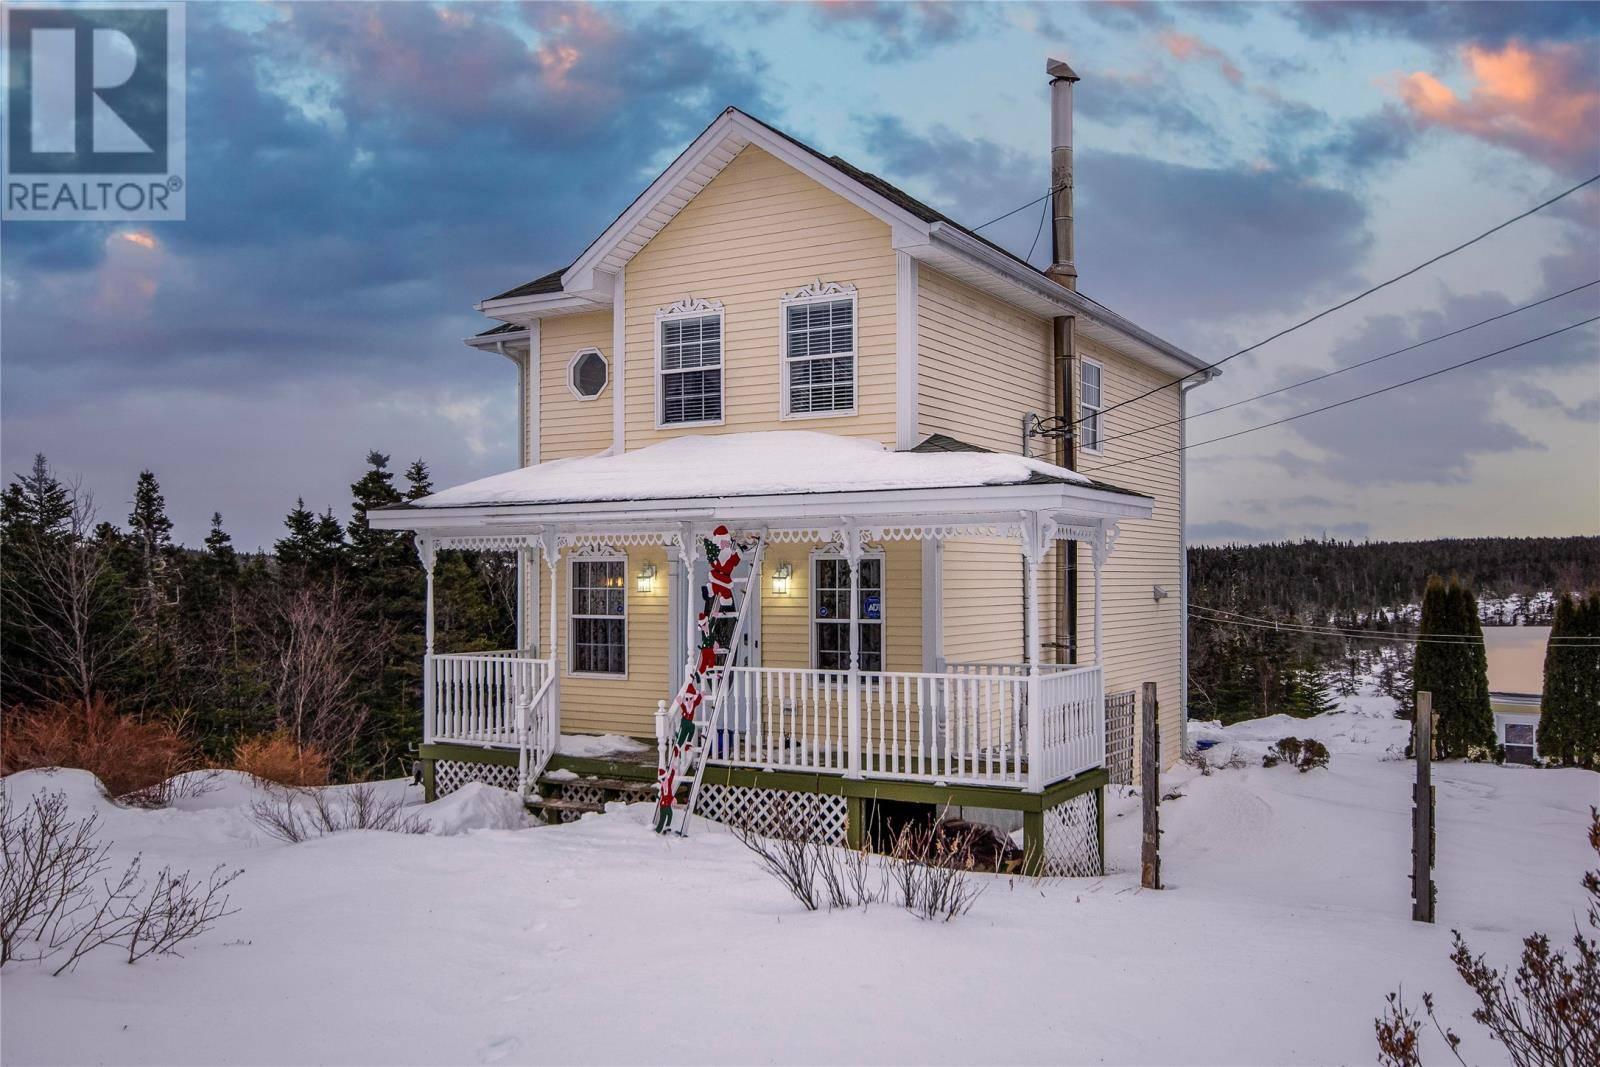 House for sale at 1226 Blackhead Rd St. John's Newfoundland - MLS: 1211189